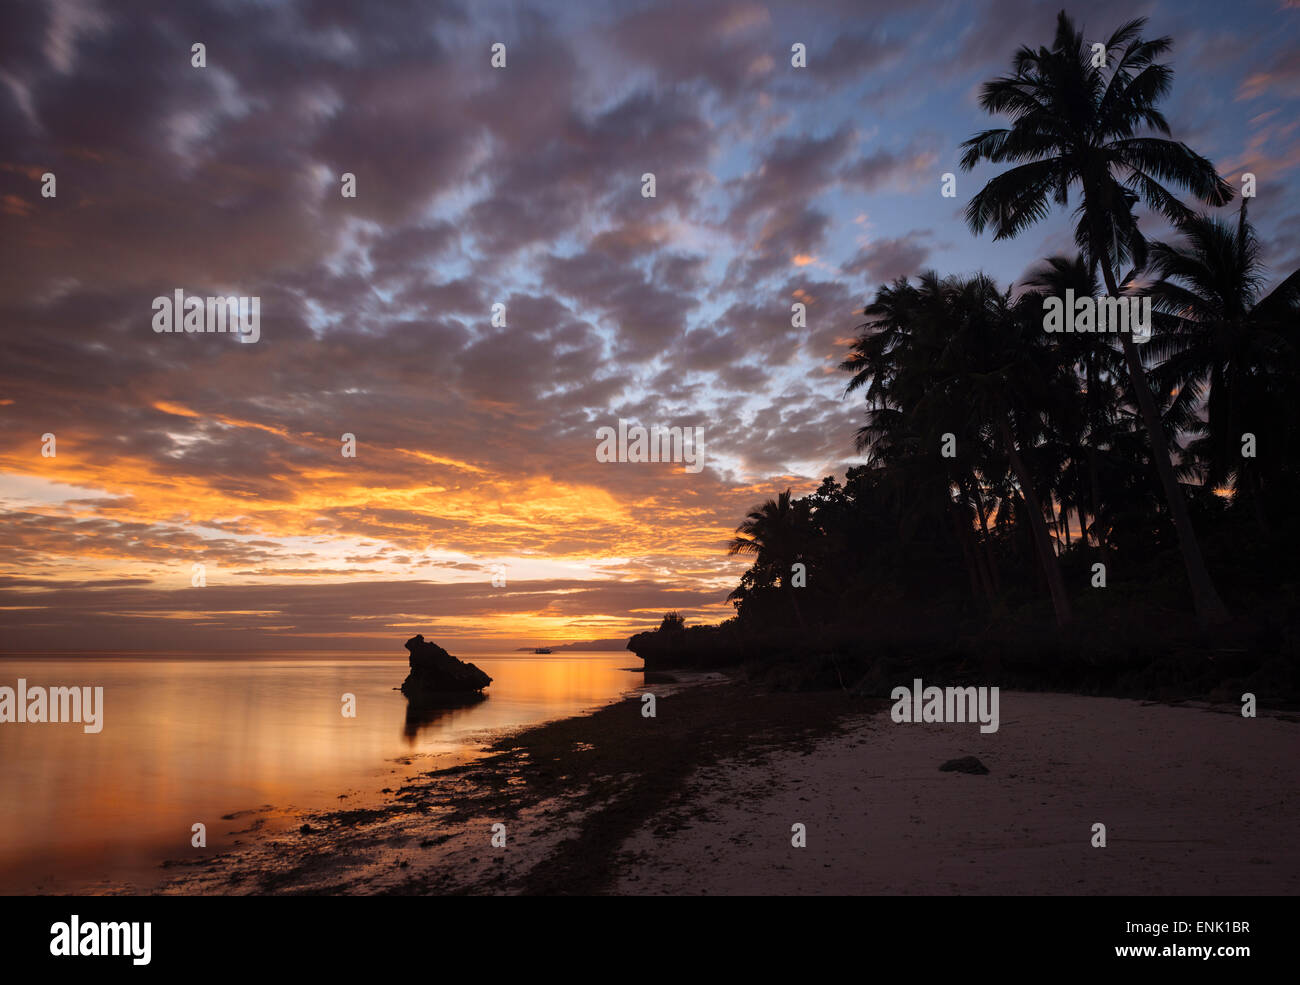 Eun Beach, Isola di Bohol, Visayas, Filippine, Sud-est asiatico, in Asia Foto Stock